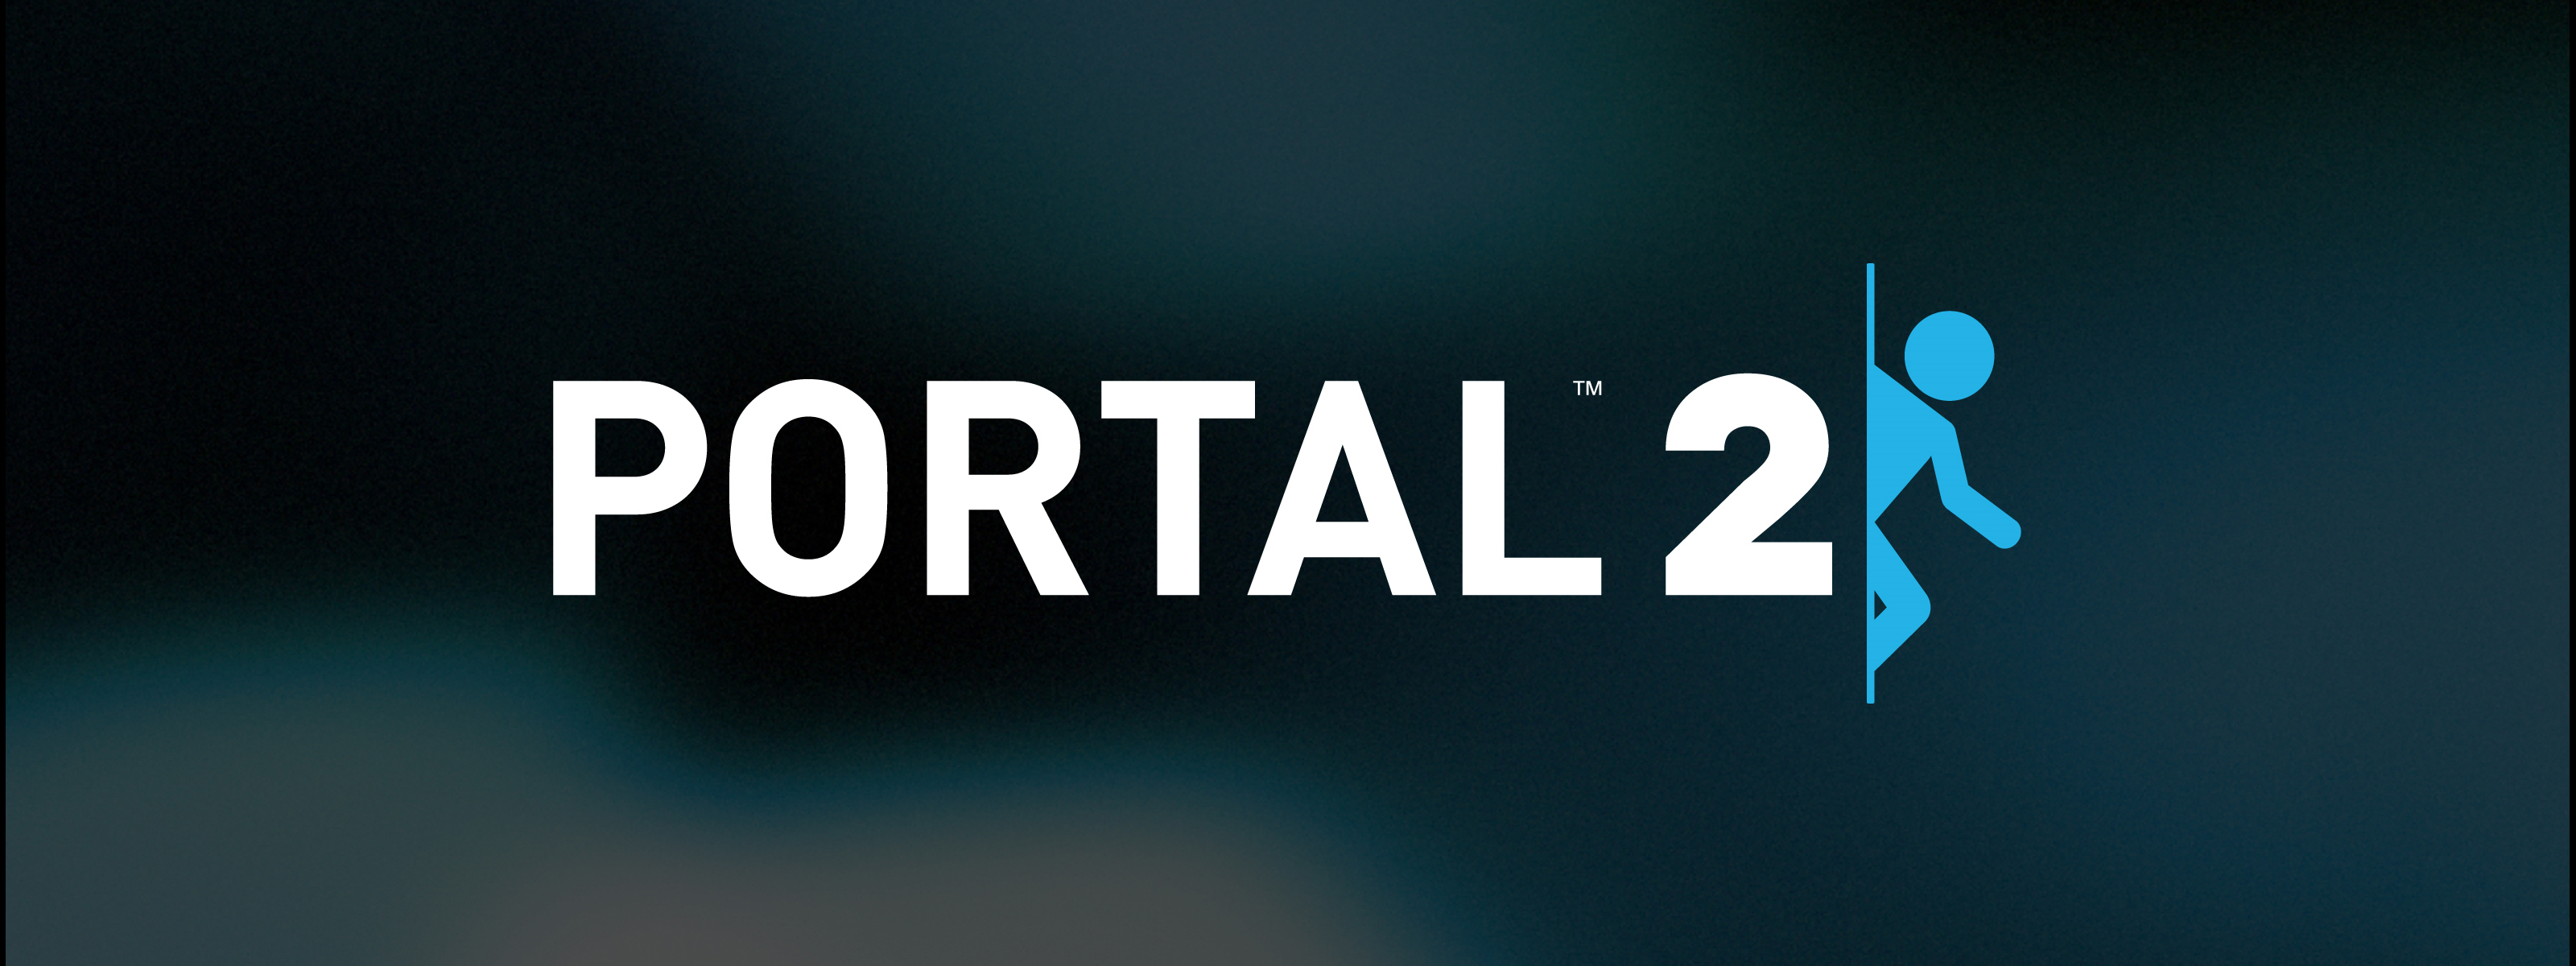 New Portal 2 Wallpaper Dual Monitor Wallpapers 3200x1200